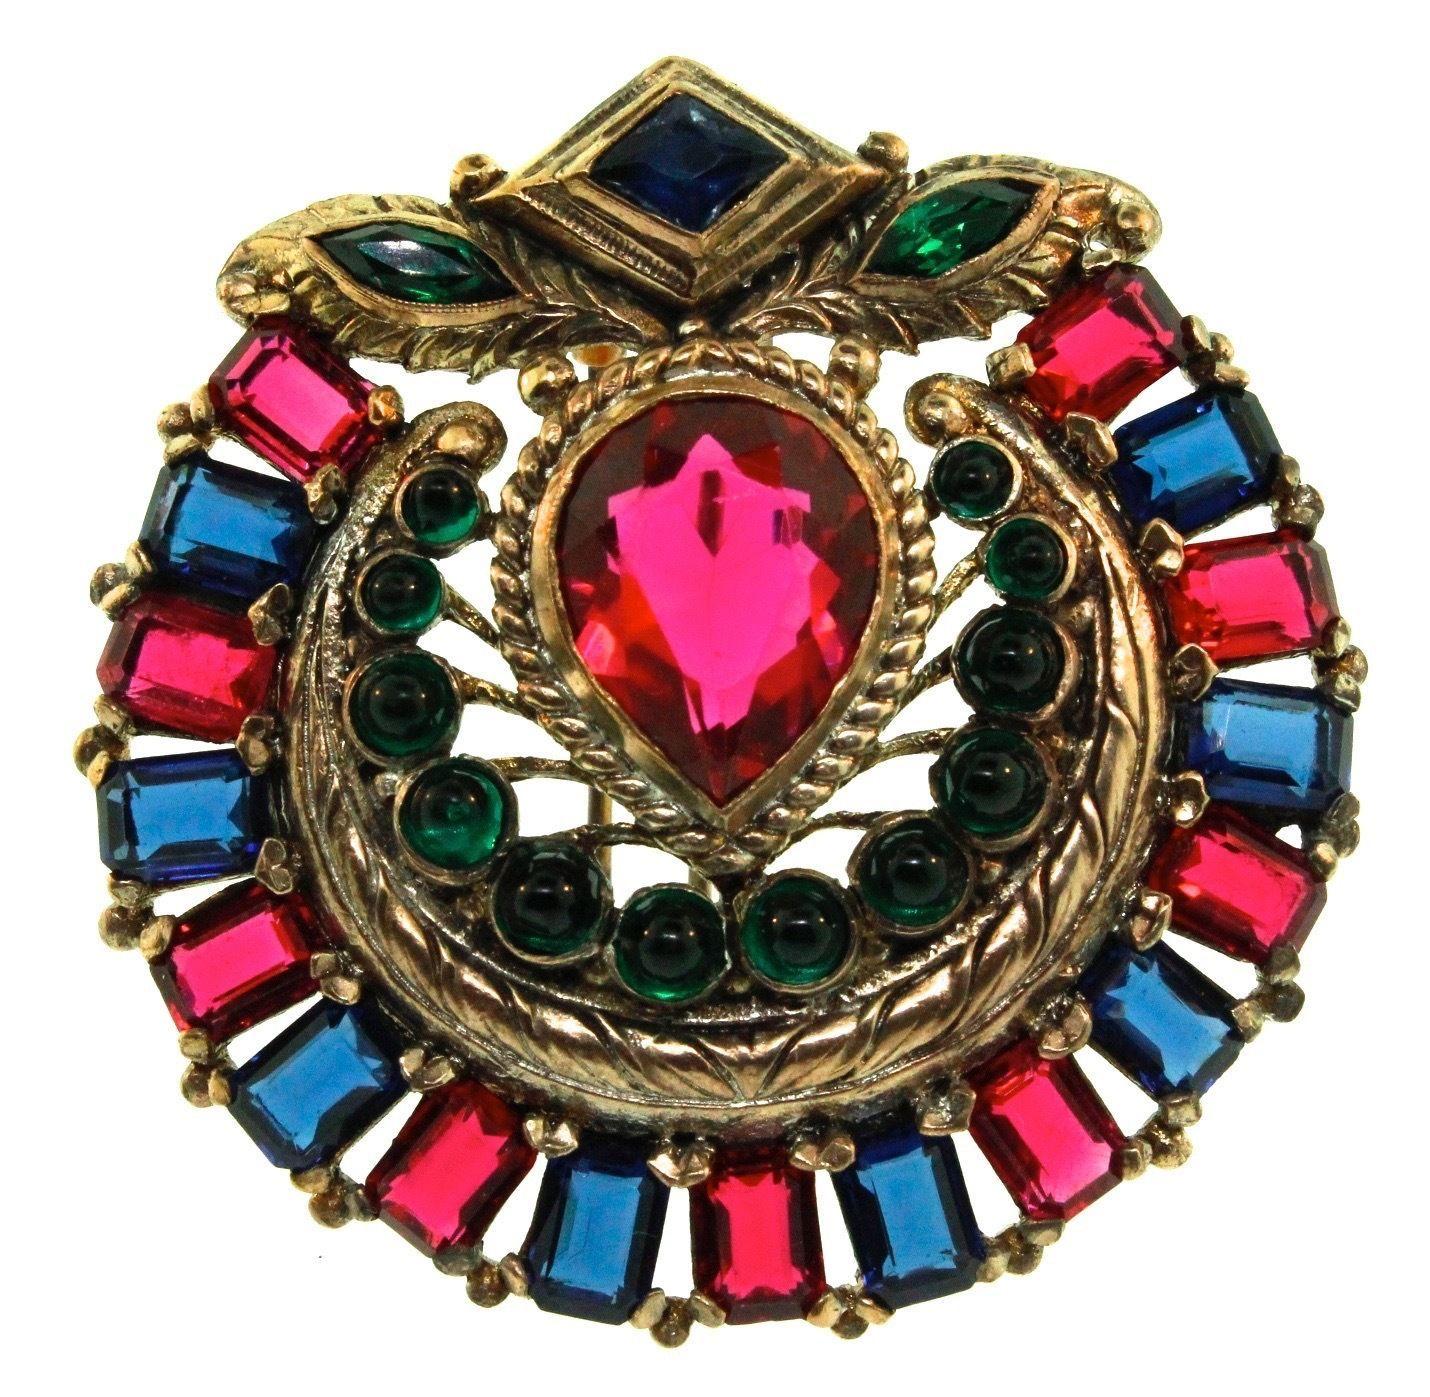 RARE 1930's Philippe Trifari Jewels of India Rhinestone Cab Brooch Fur Clip Pin | eBay